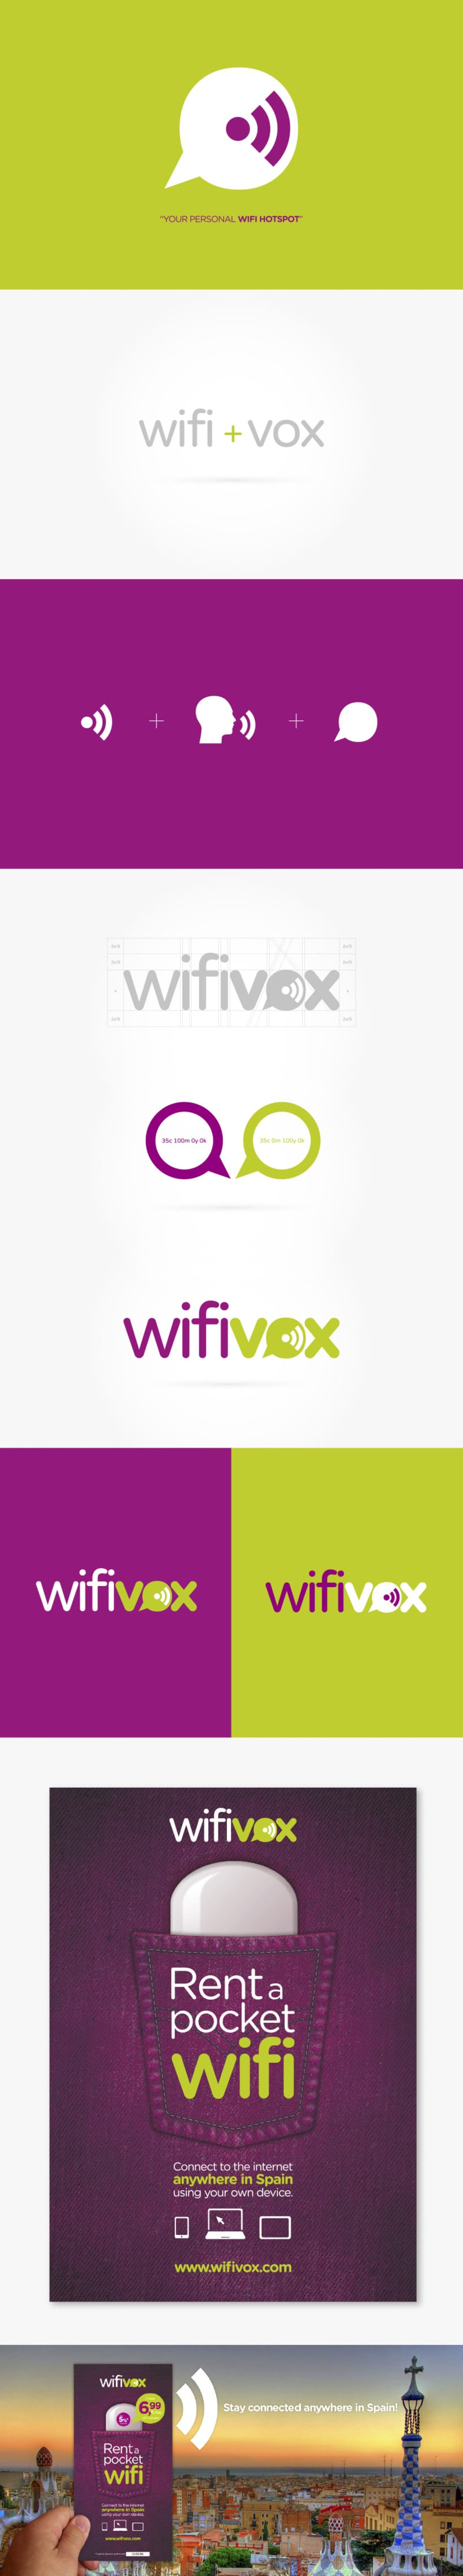 Wifivox 1